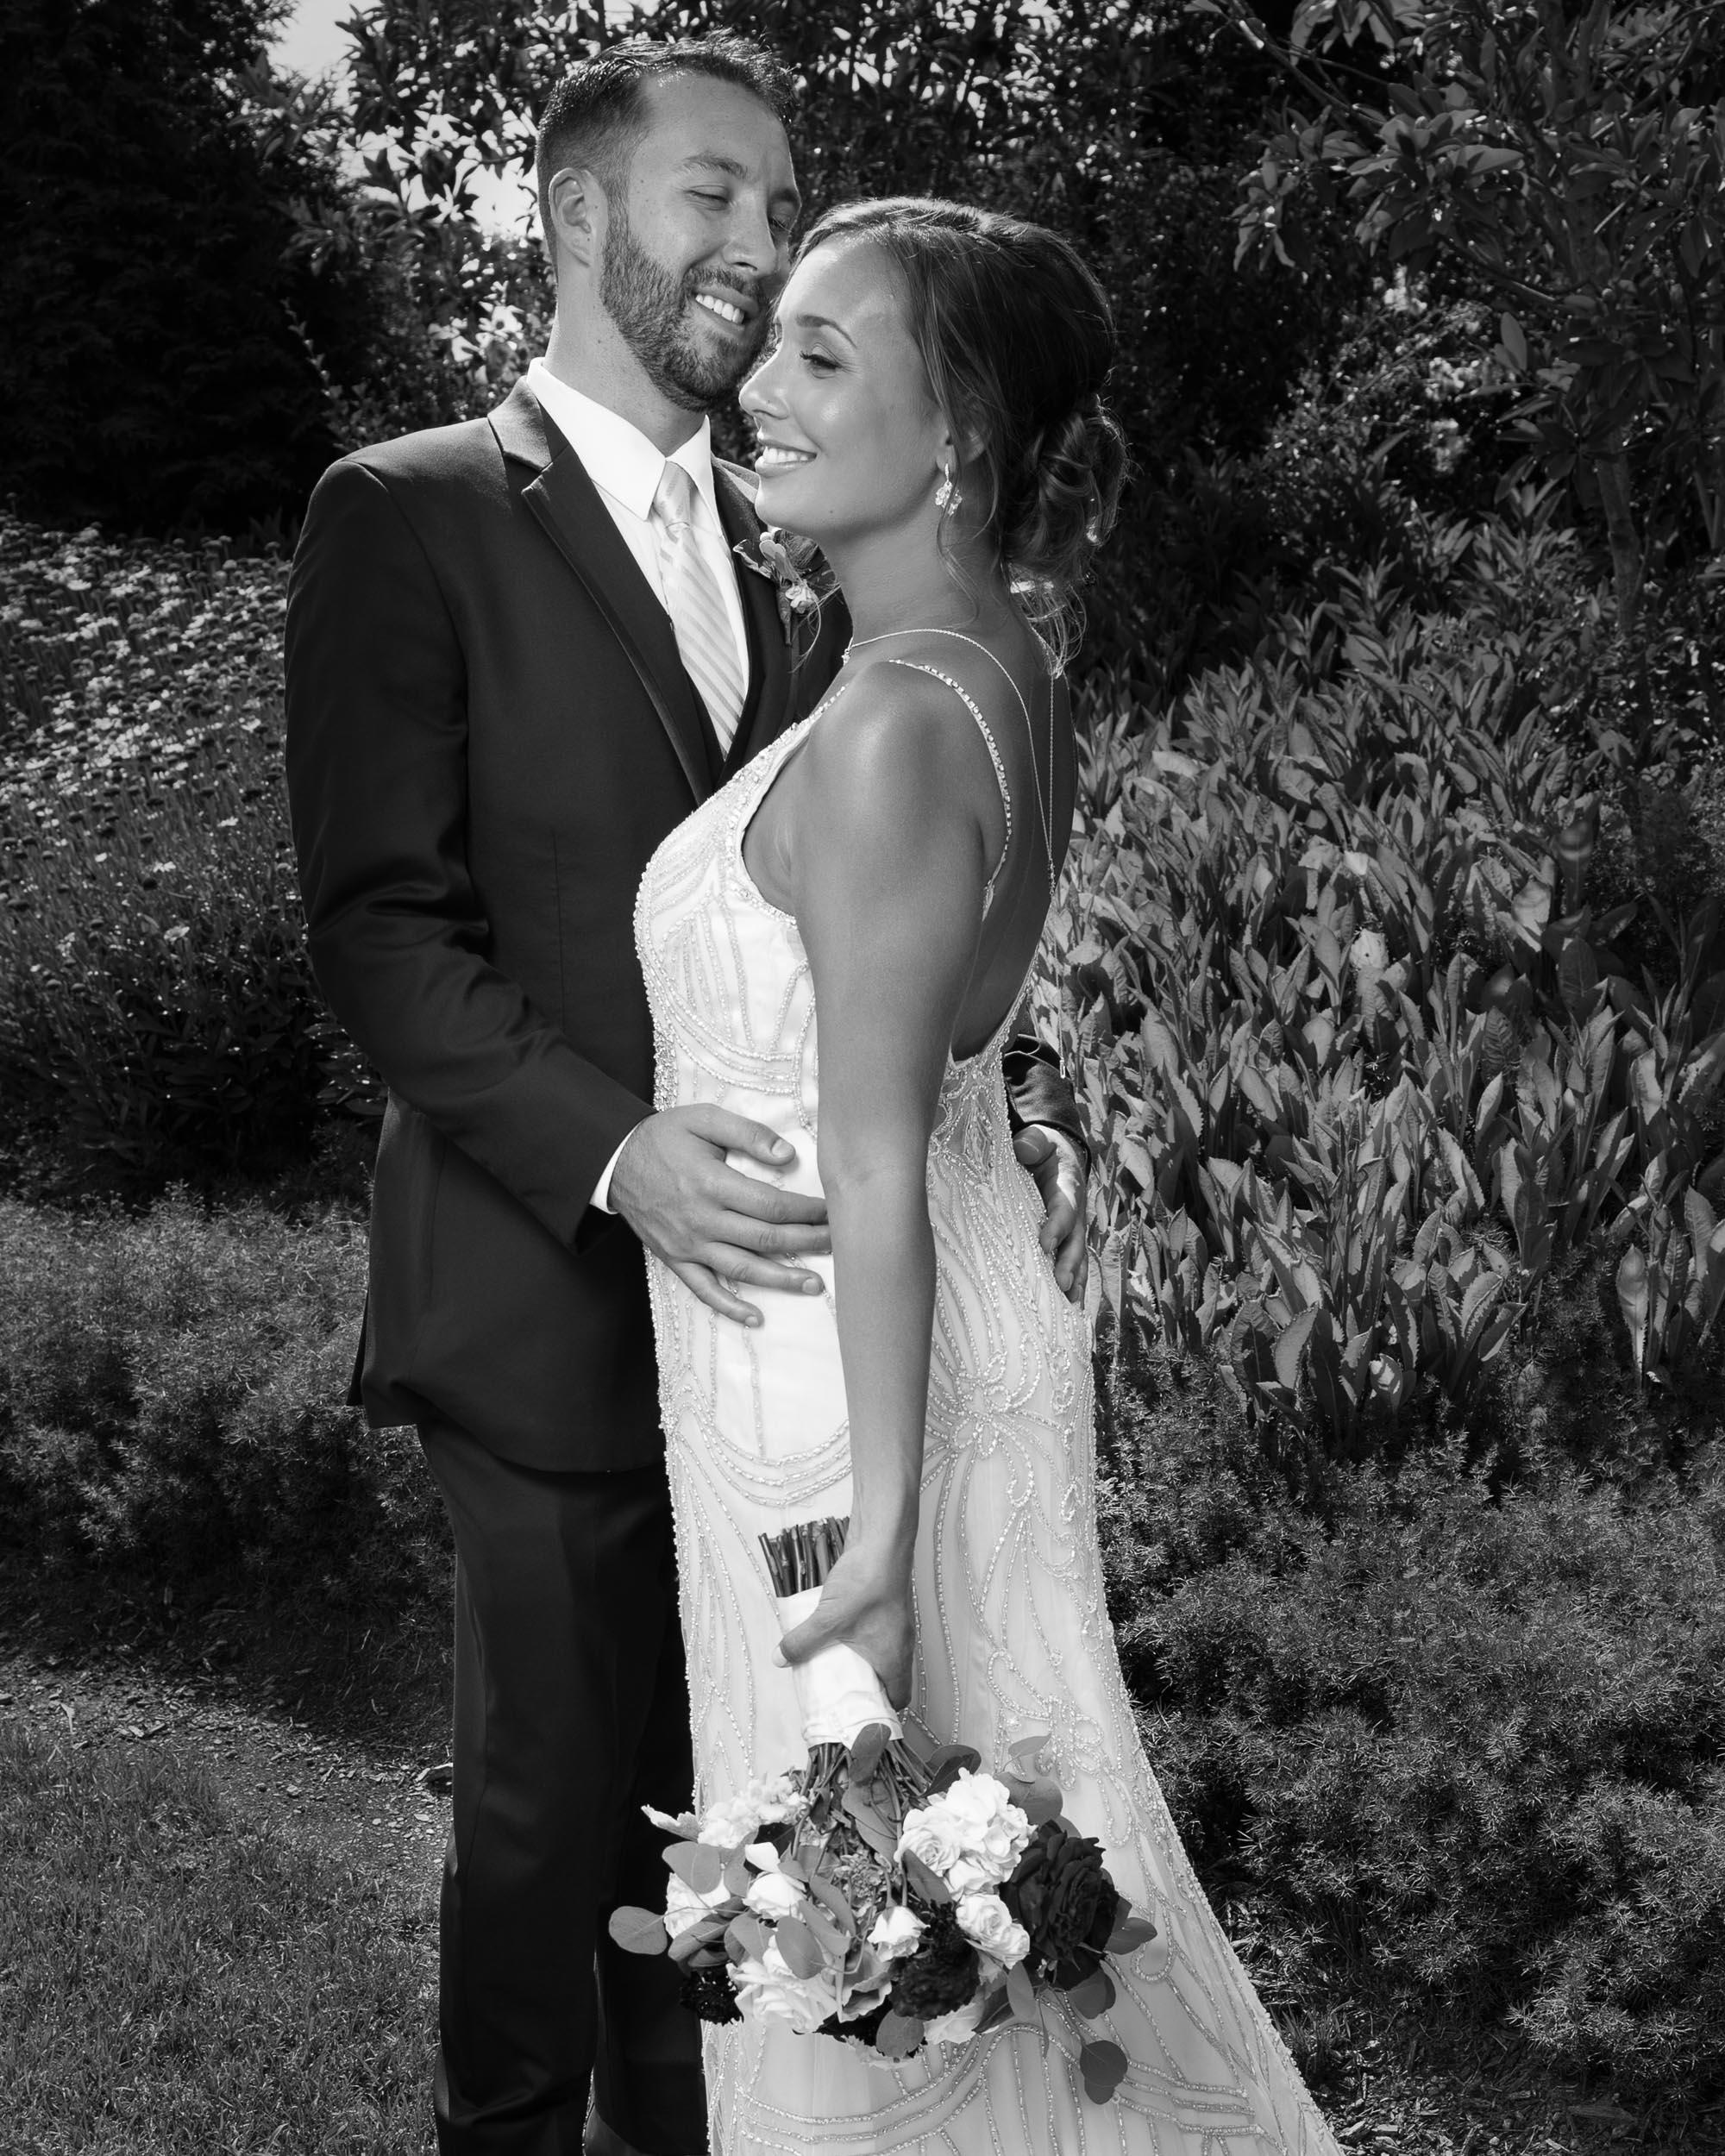 Bride-and-Groom-Portraits-3.jpg